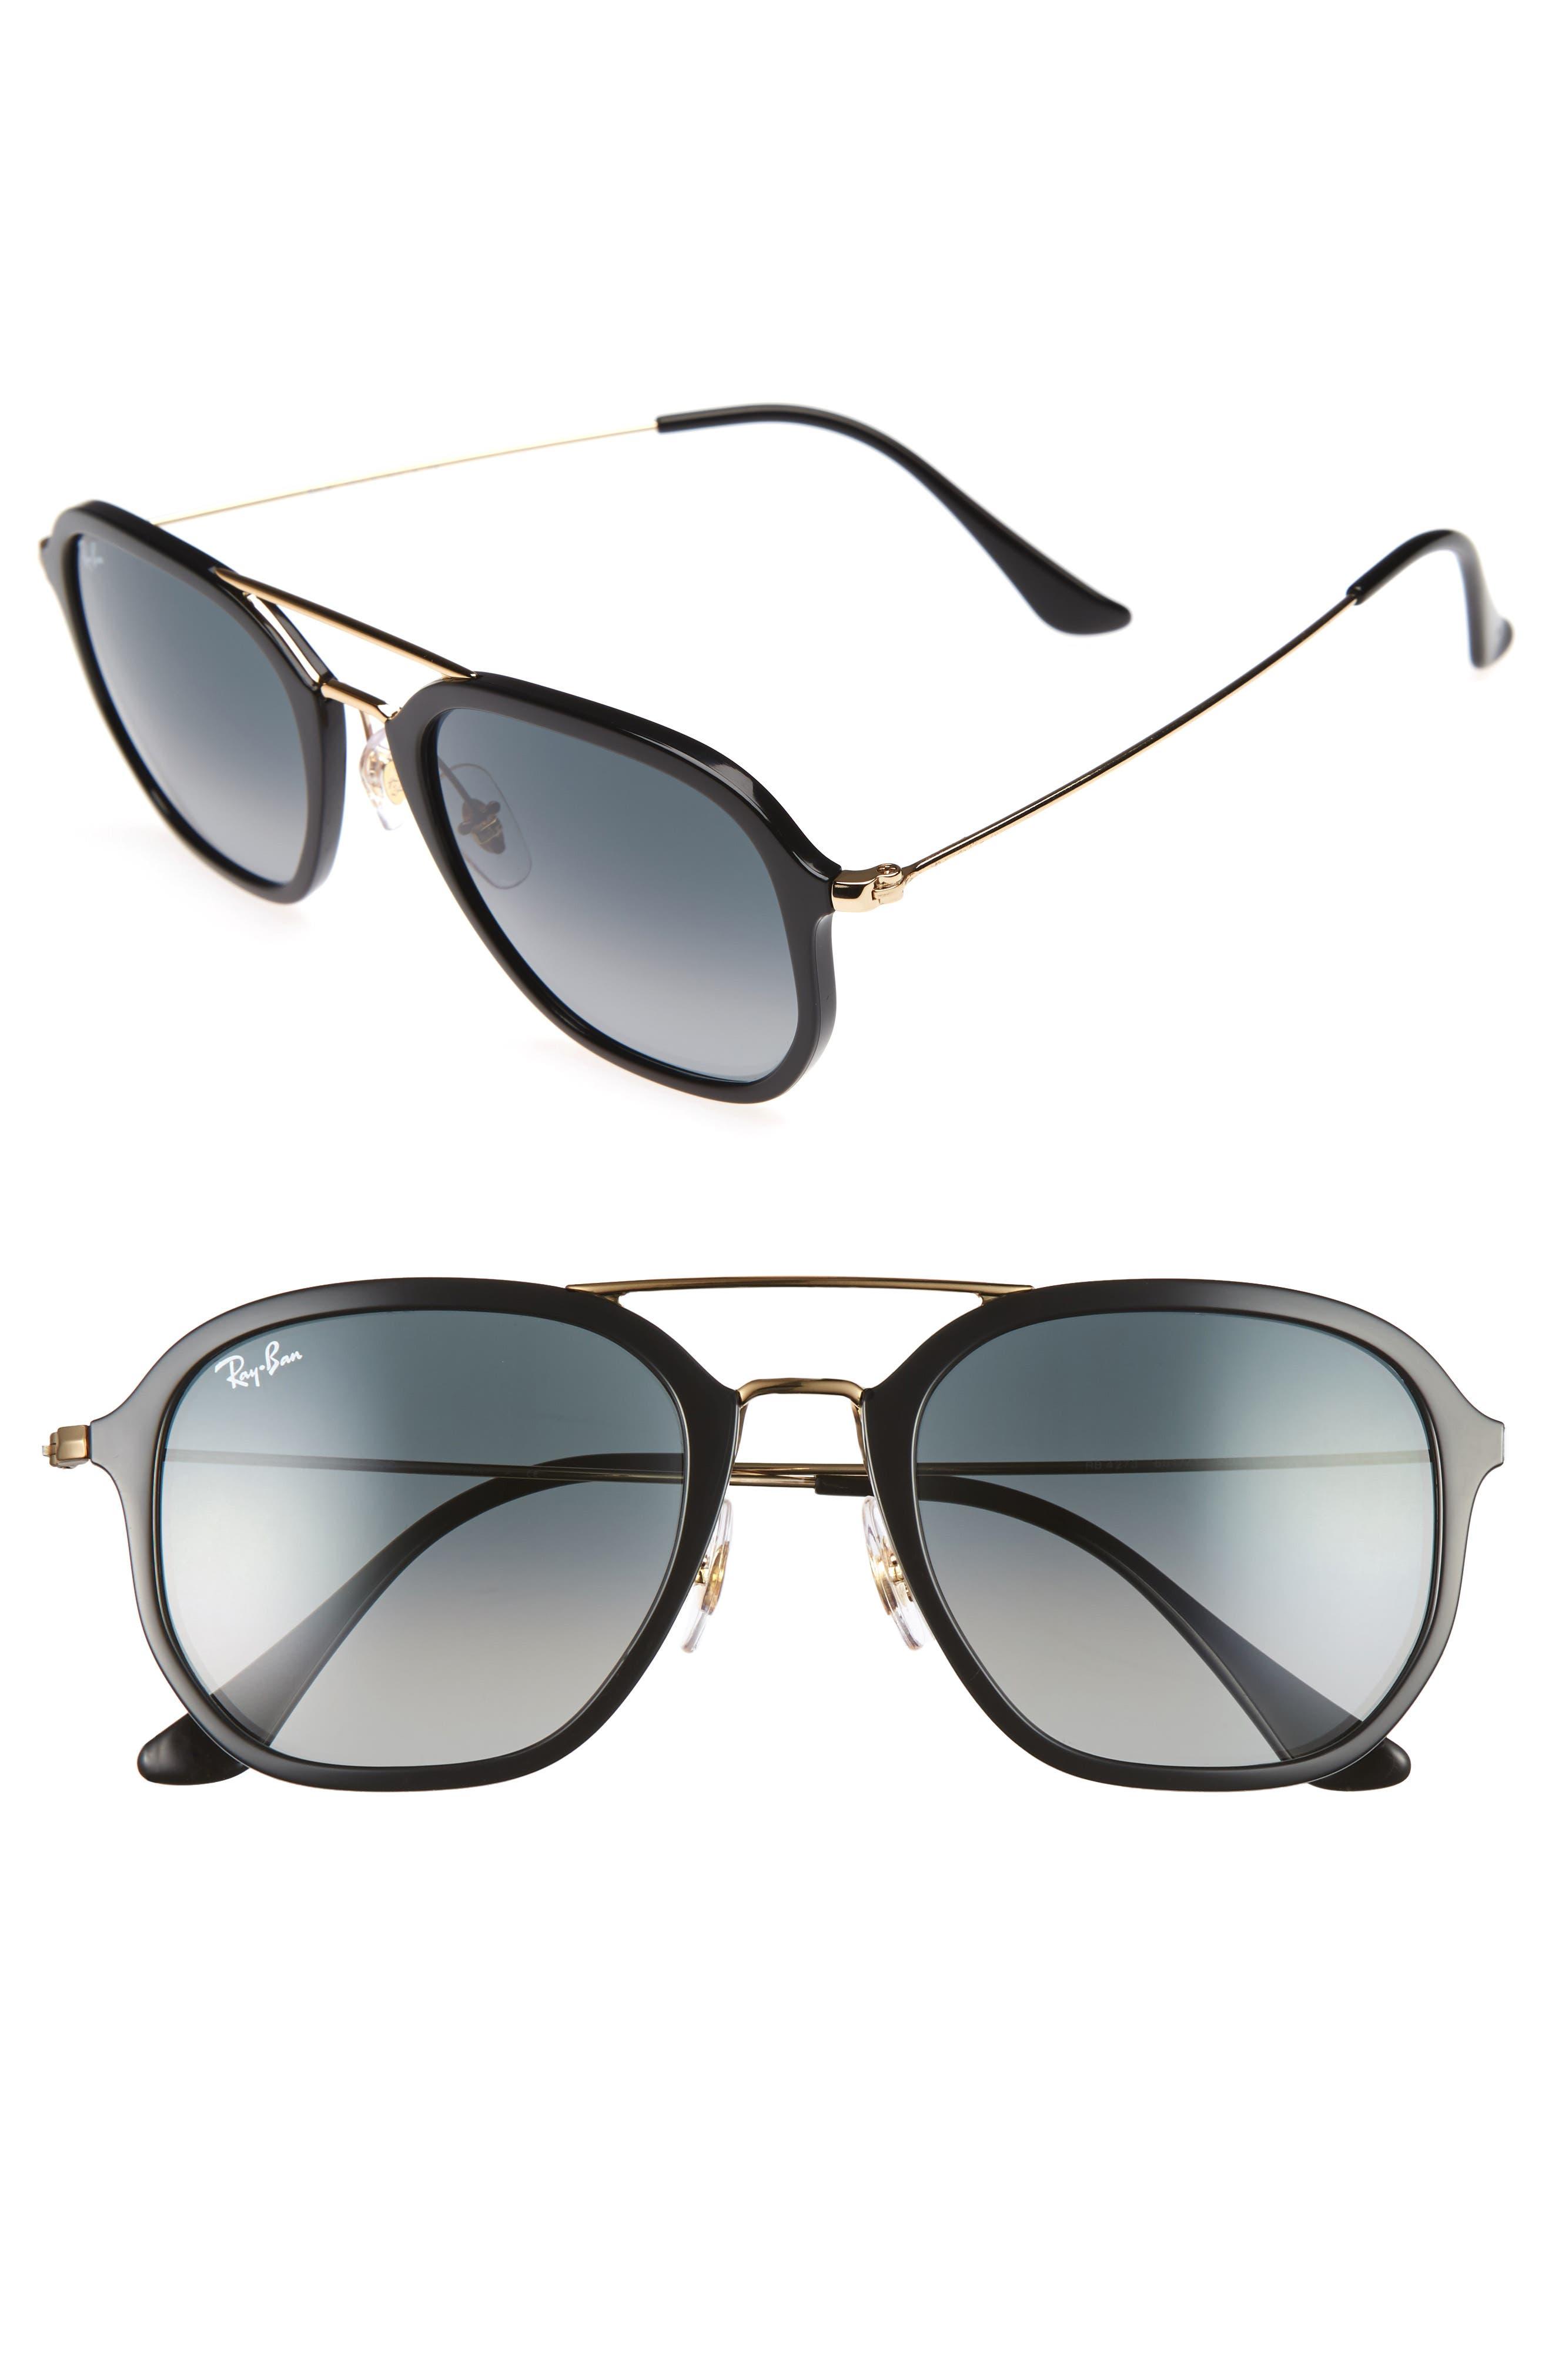 52mm Square Sunglasses,                             Main thumbnail 1, color,